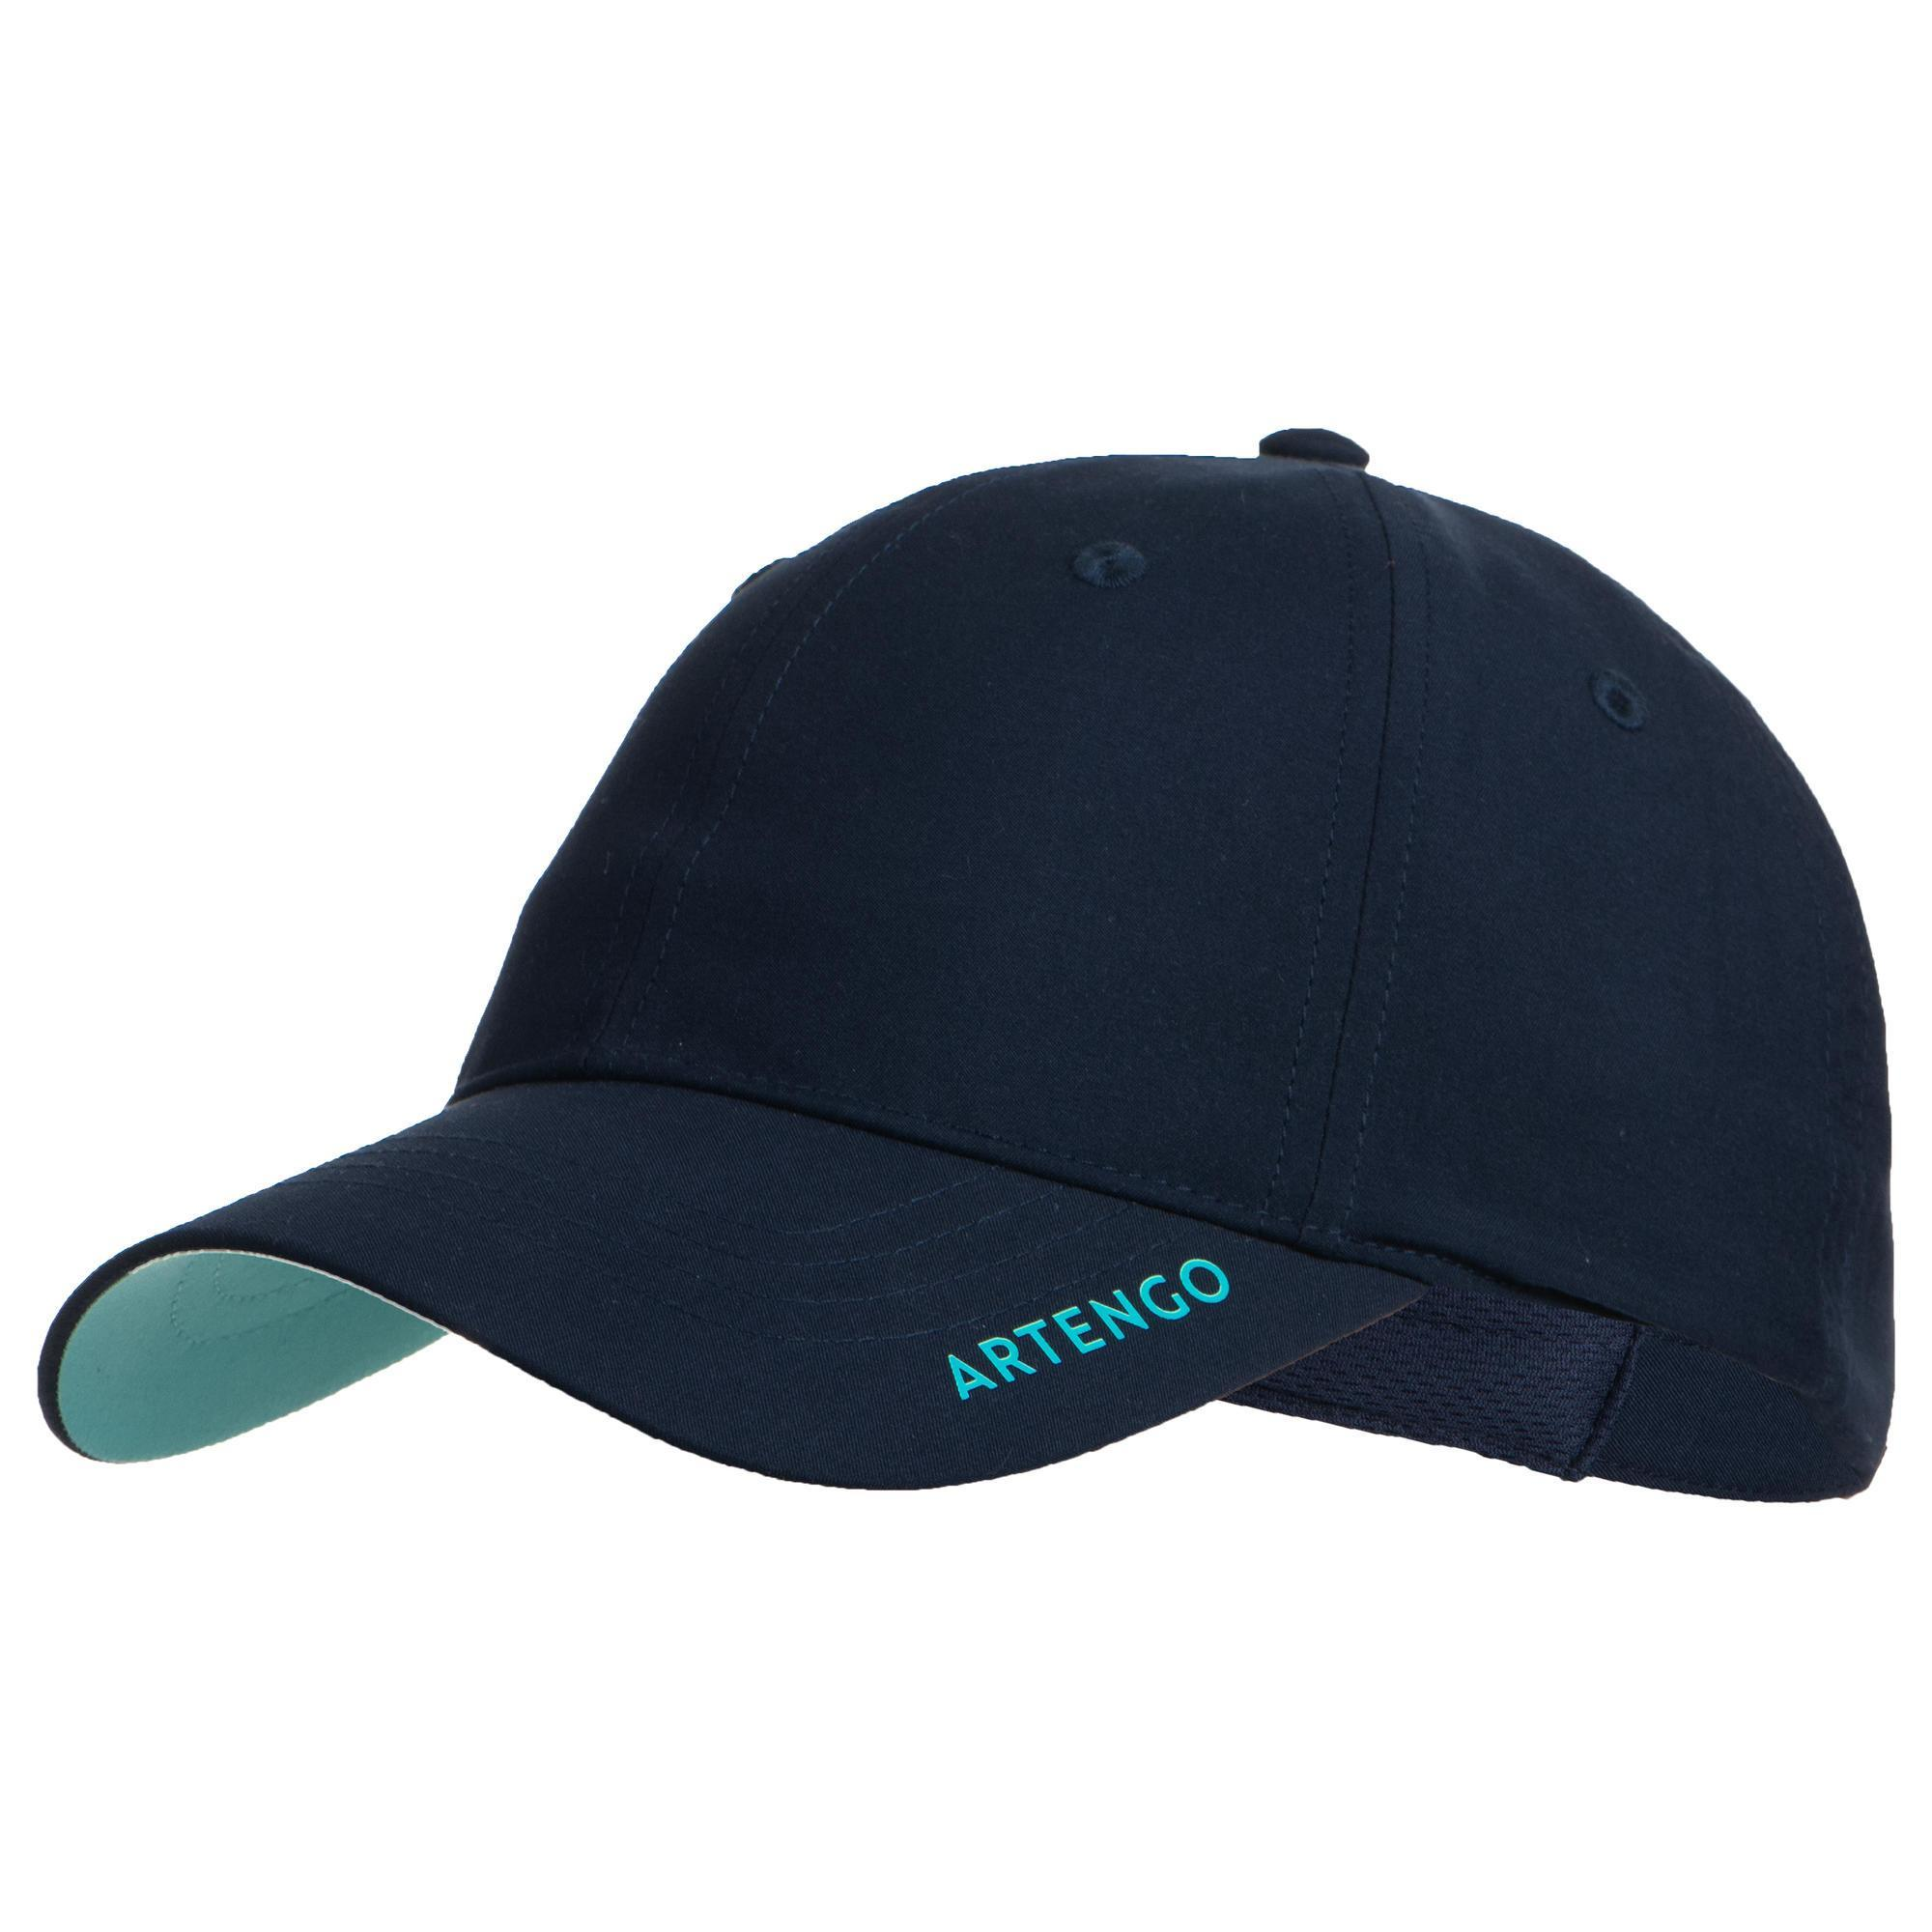 Schirmmütze Tennis-Cap TC 500 Gr.56 marineblau/türkis